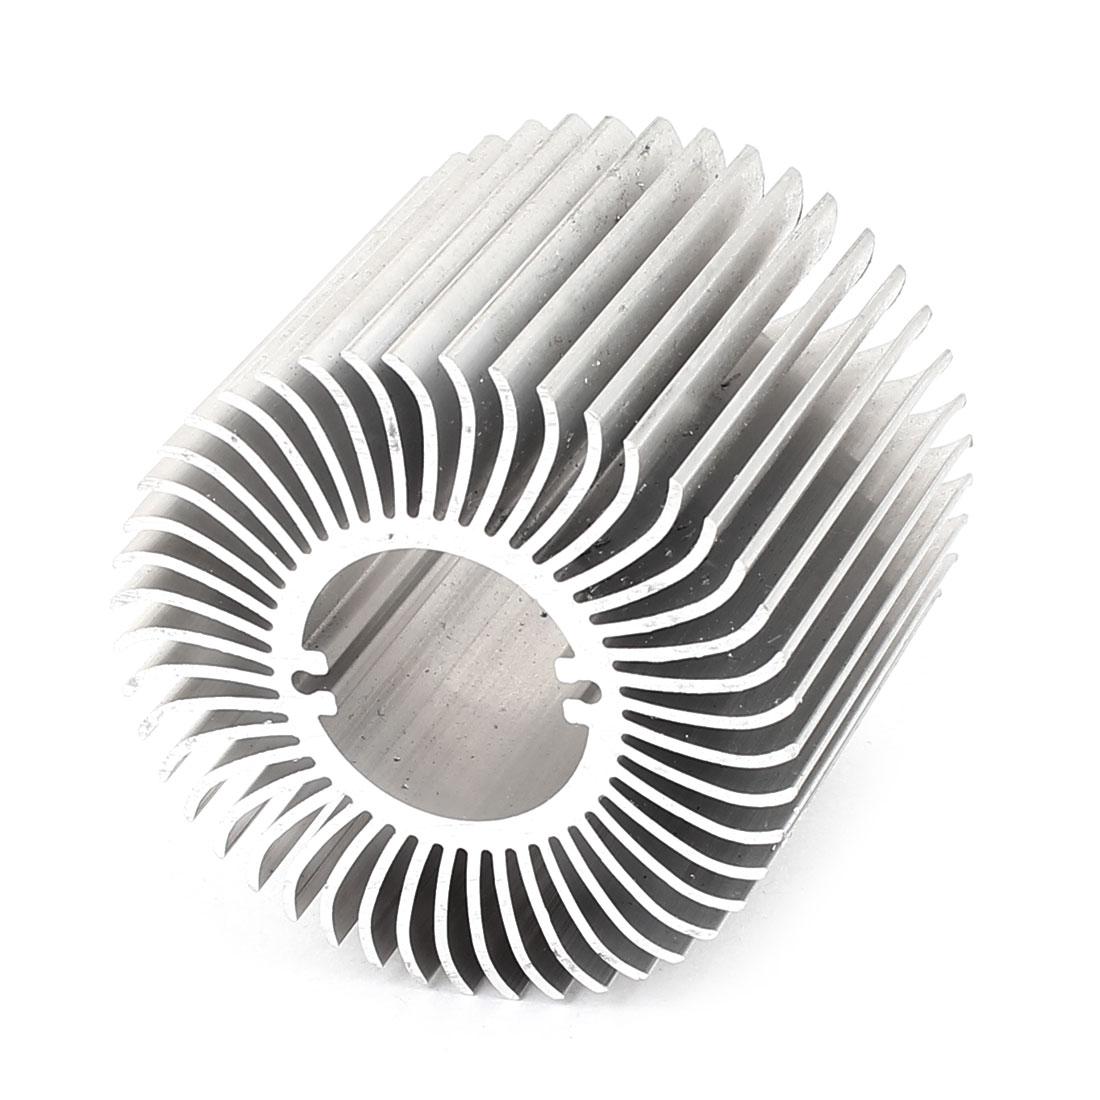 62mm x 50mm Cylinder 5W Power LED Heatsink Aluminium Cooling Fin